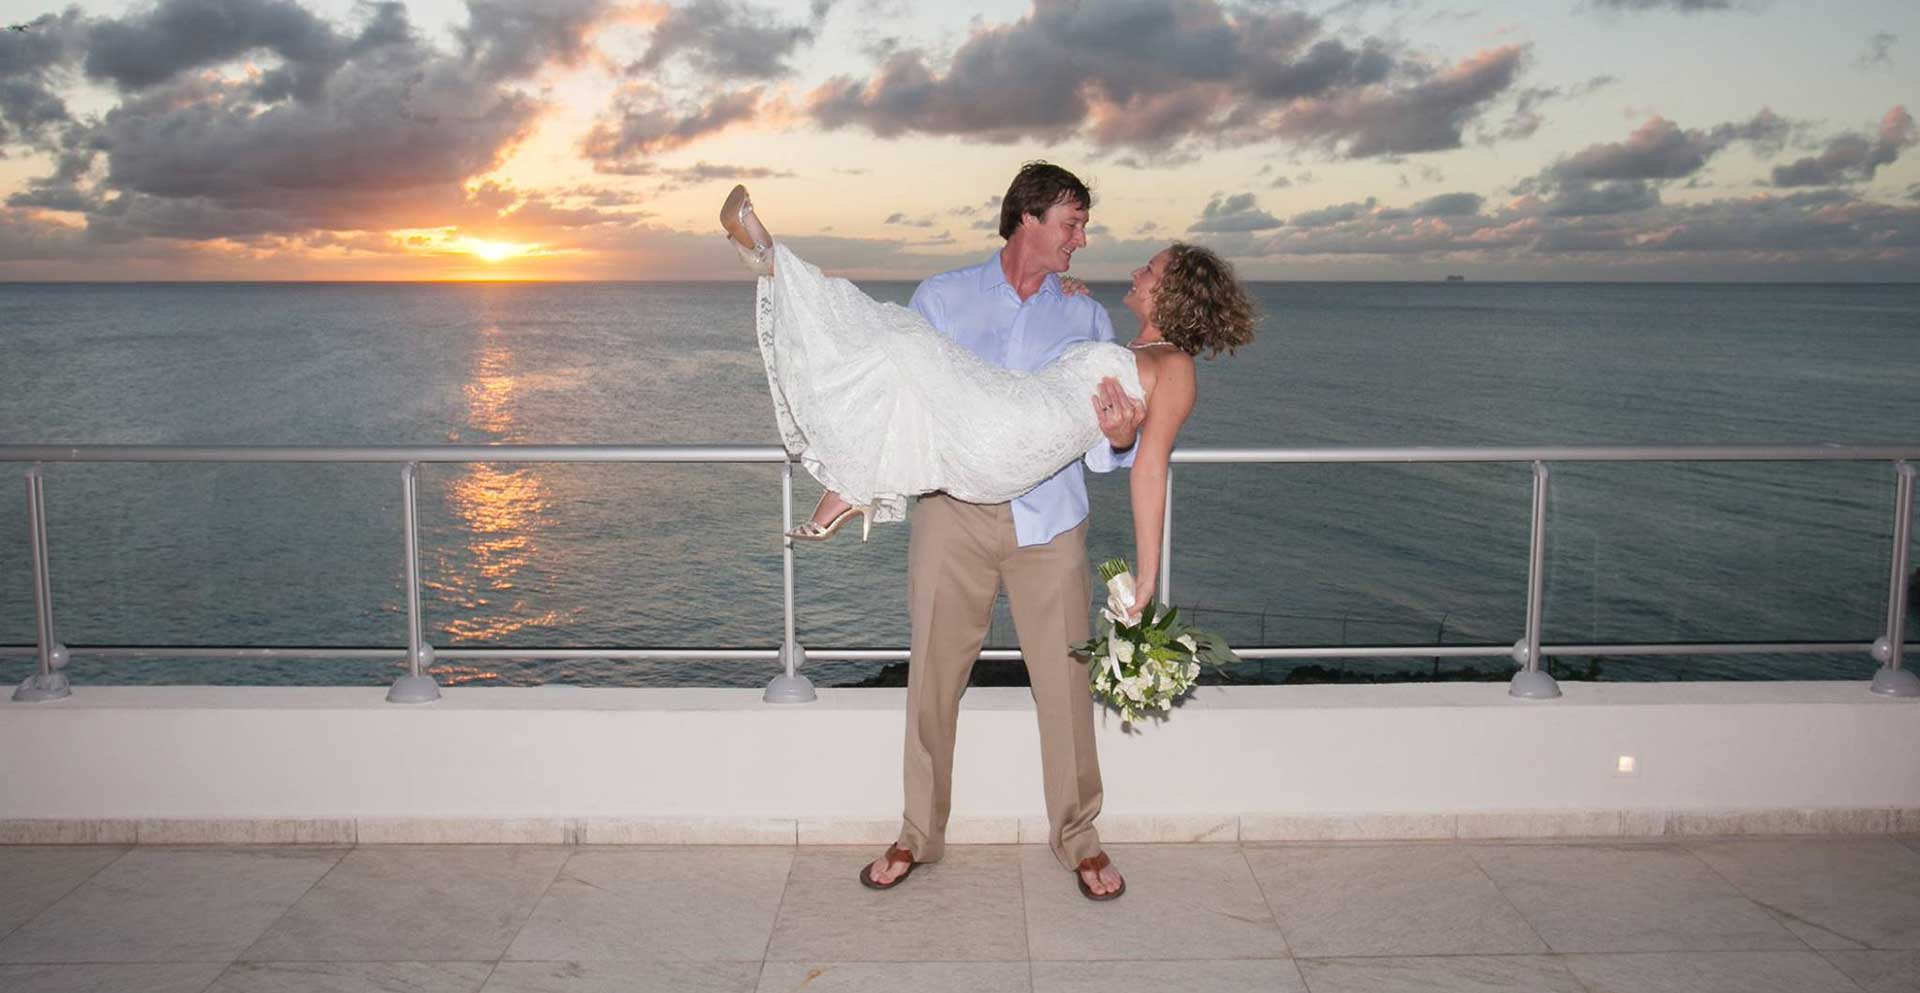 st maarten wedding at sonesta ocean point